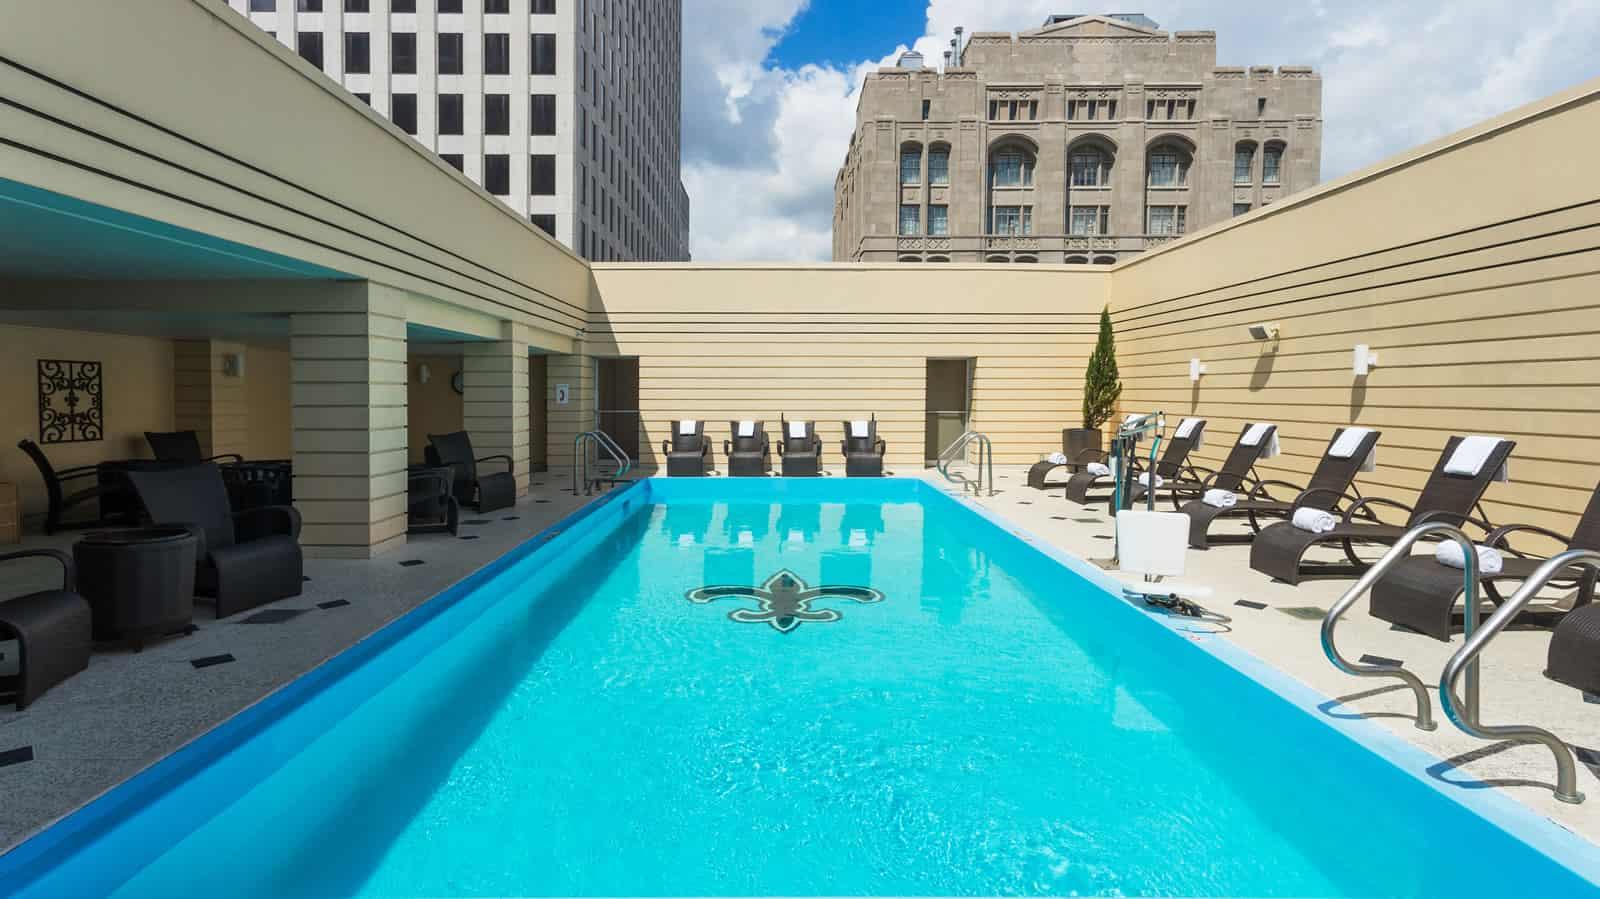 Intercon pool